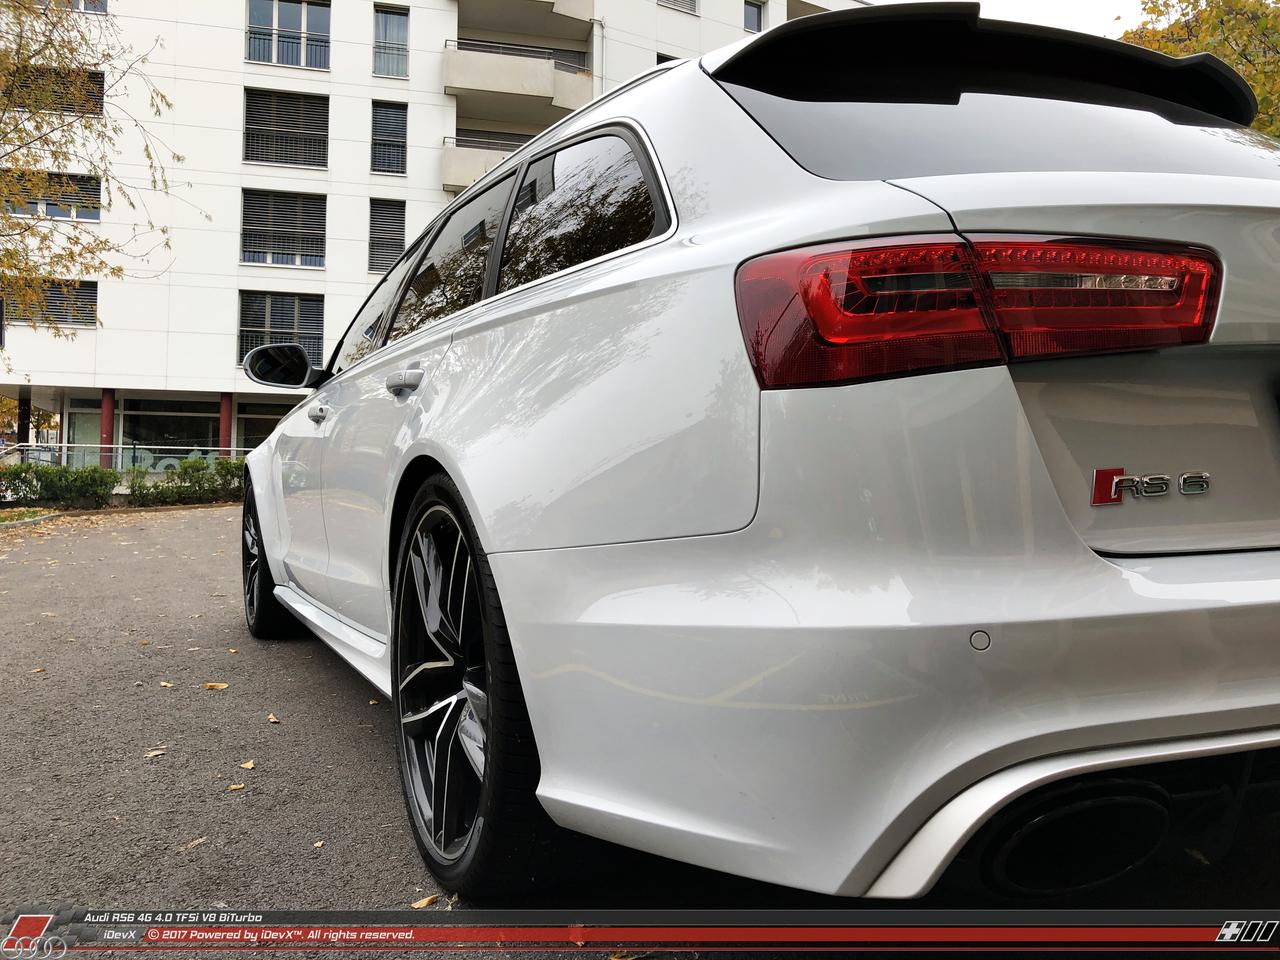 10_11.2018_Audi-RS6_iDevX_031.png